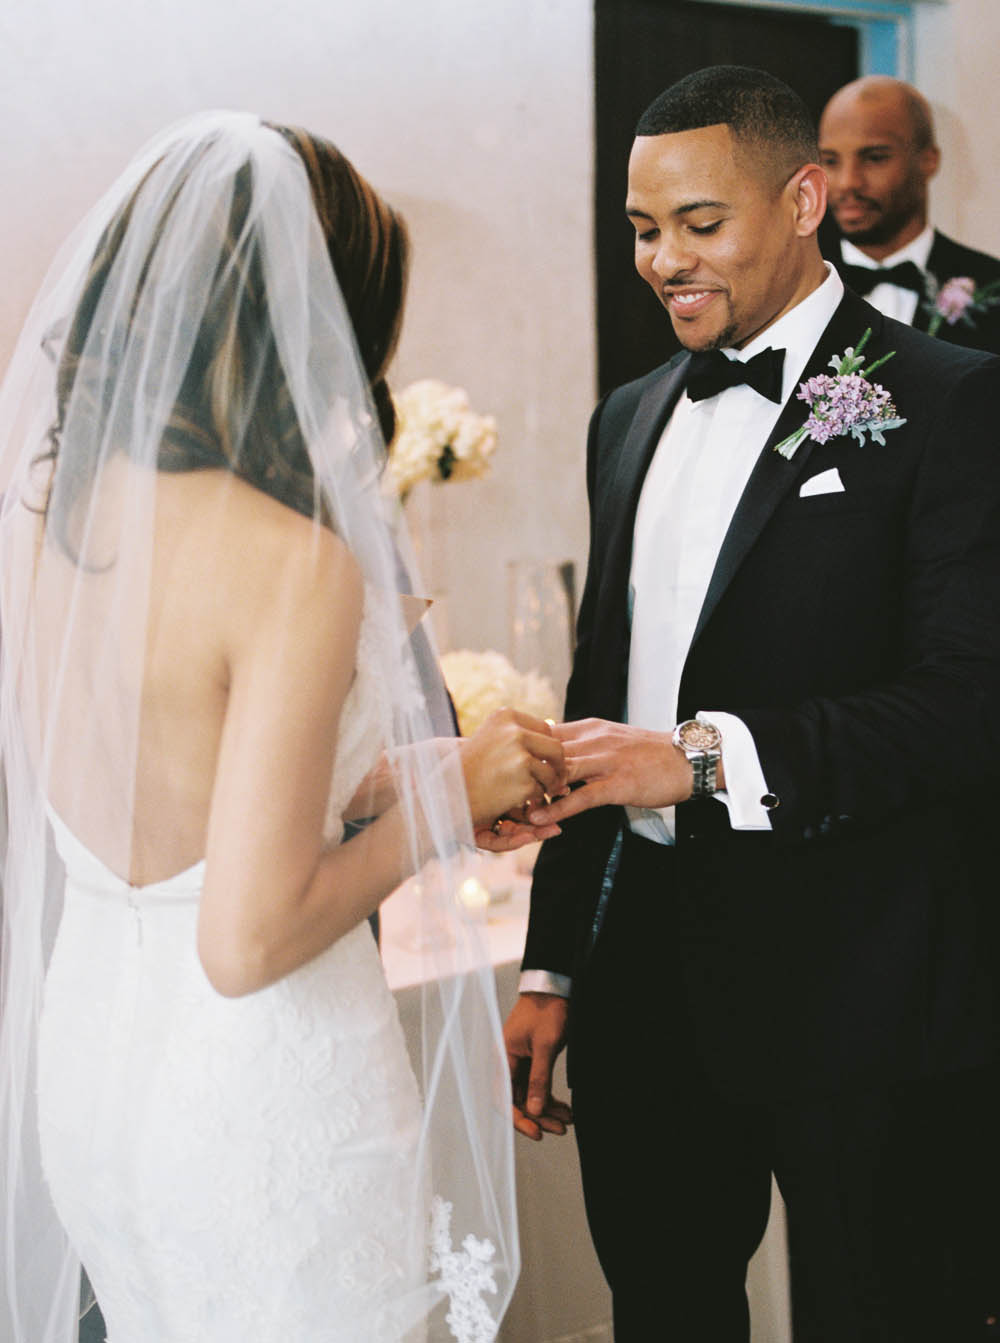 nashville ruby film documentary wedding photographer heartfelt real moments african american wedding munalachi bride ©2016abigailbobophotography-25.jpg